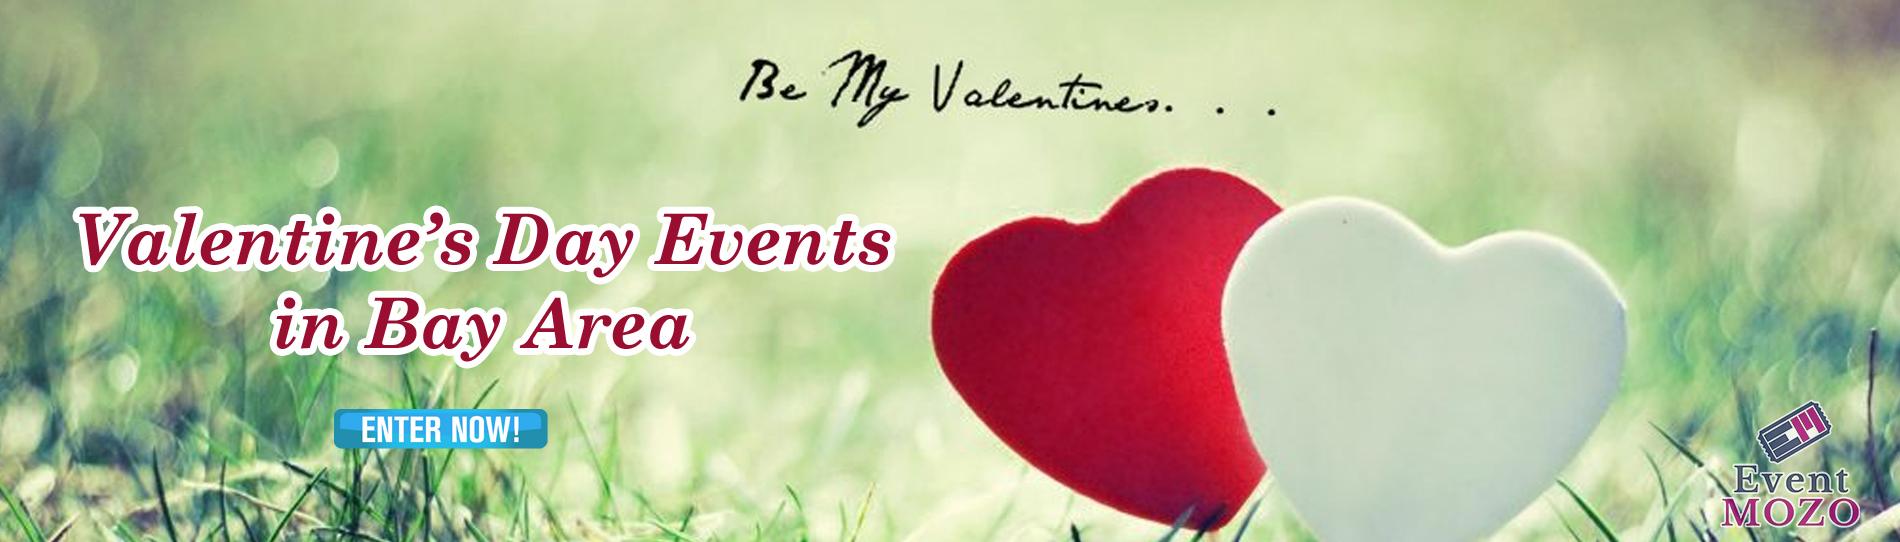 EventMozo Valentines Events Bay Area